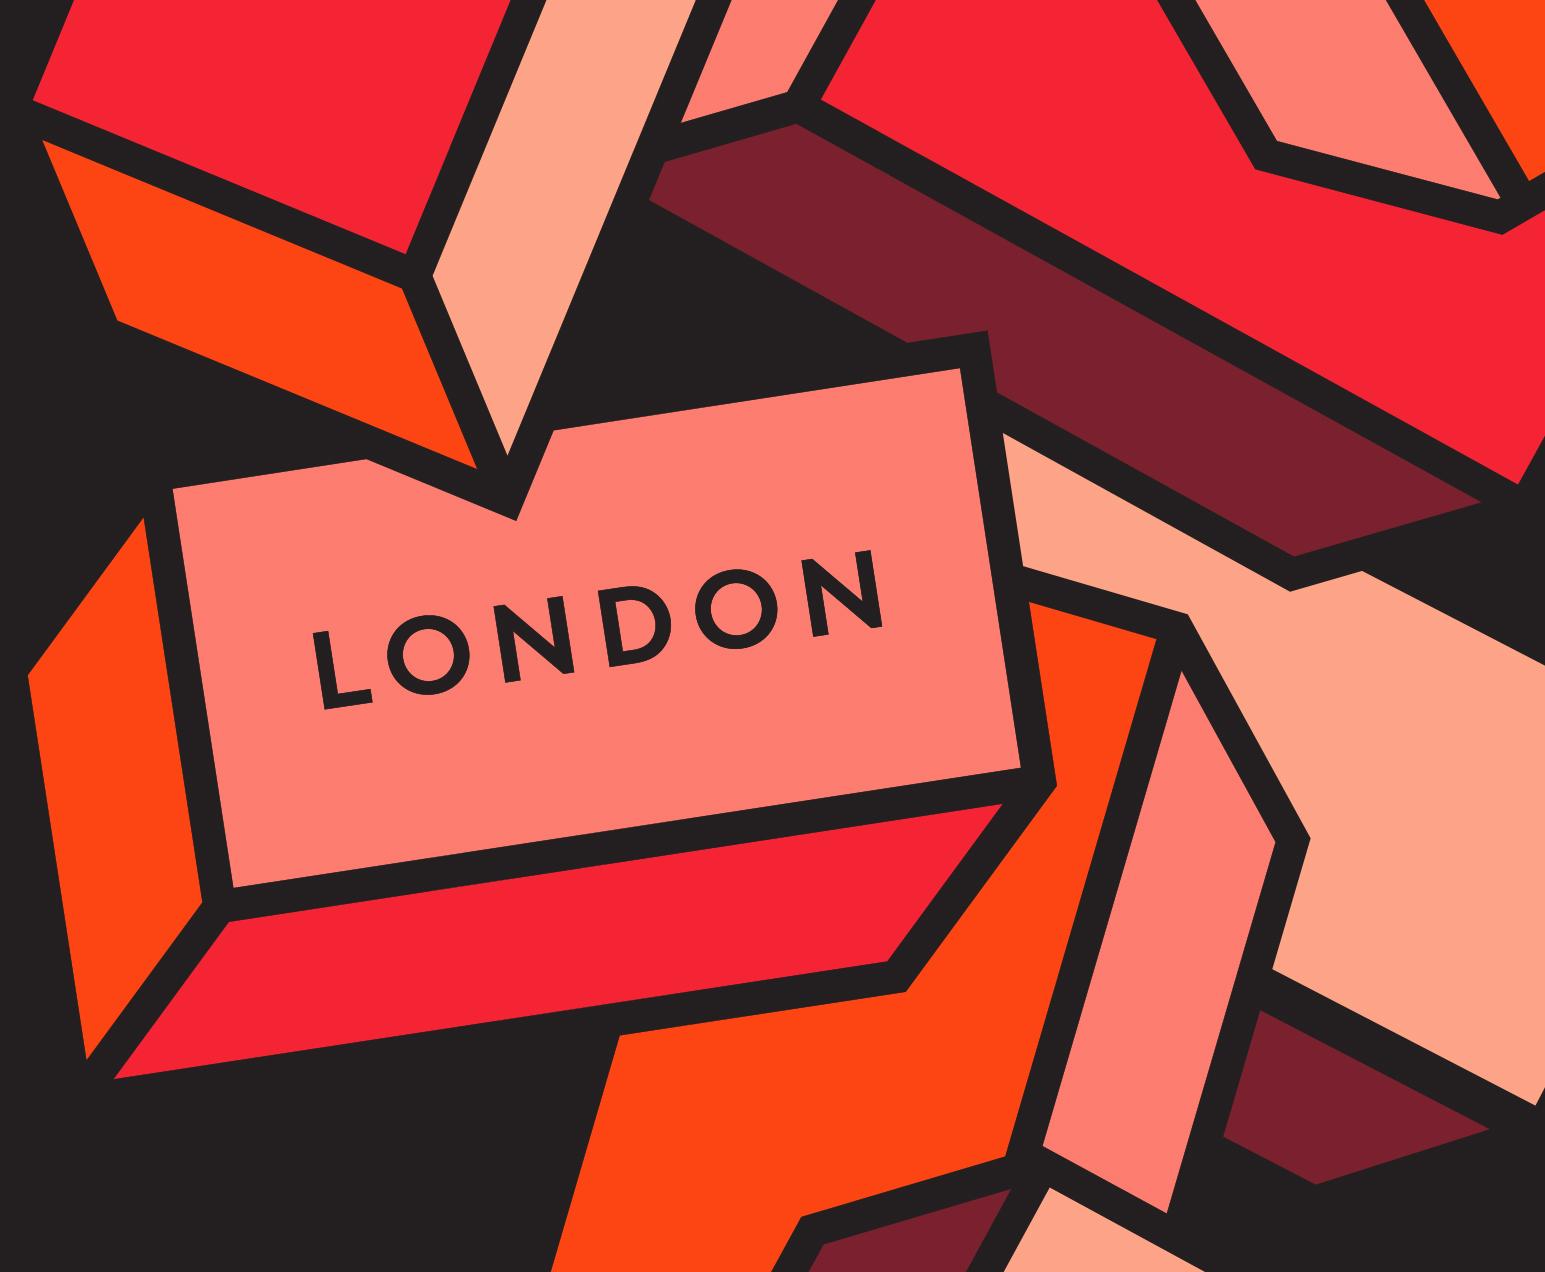 London Brick Ephemera